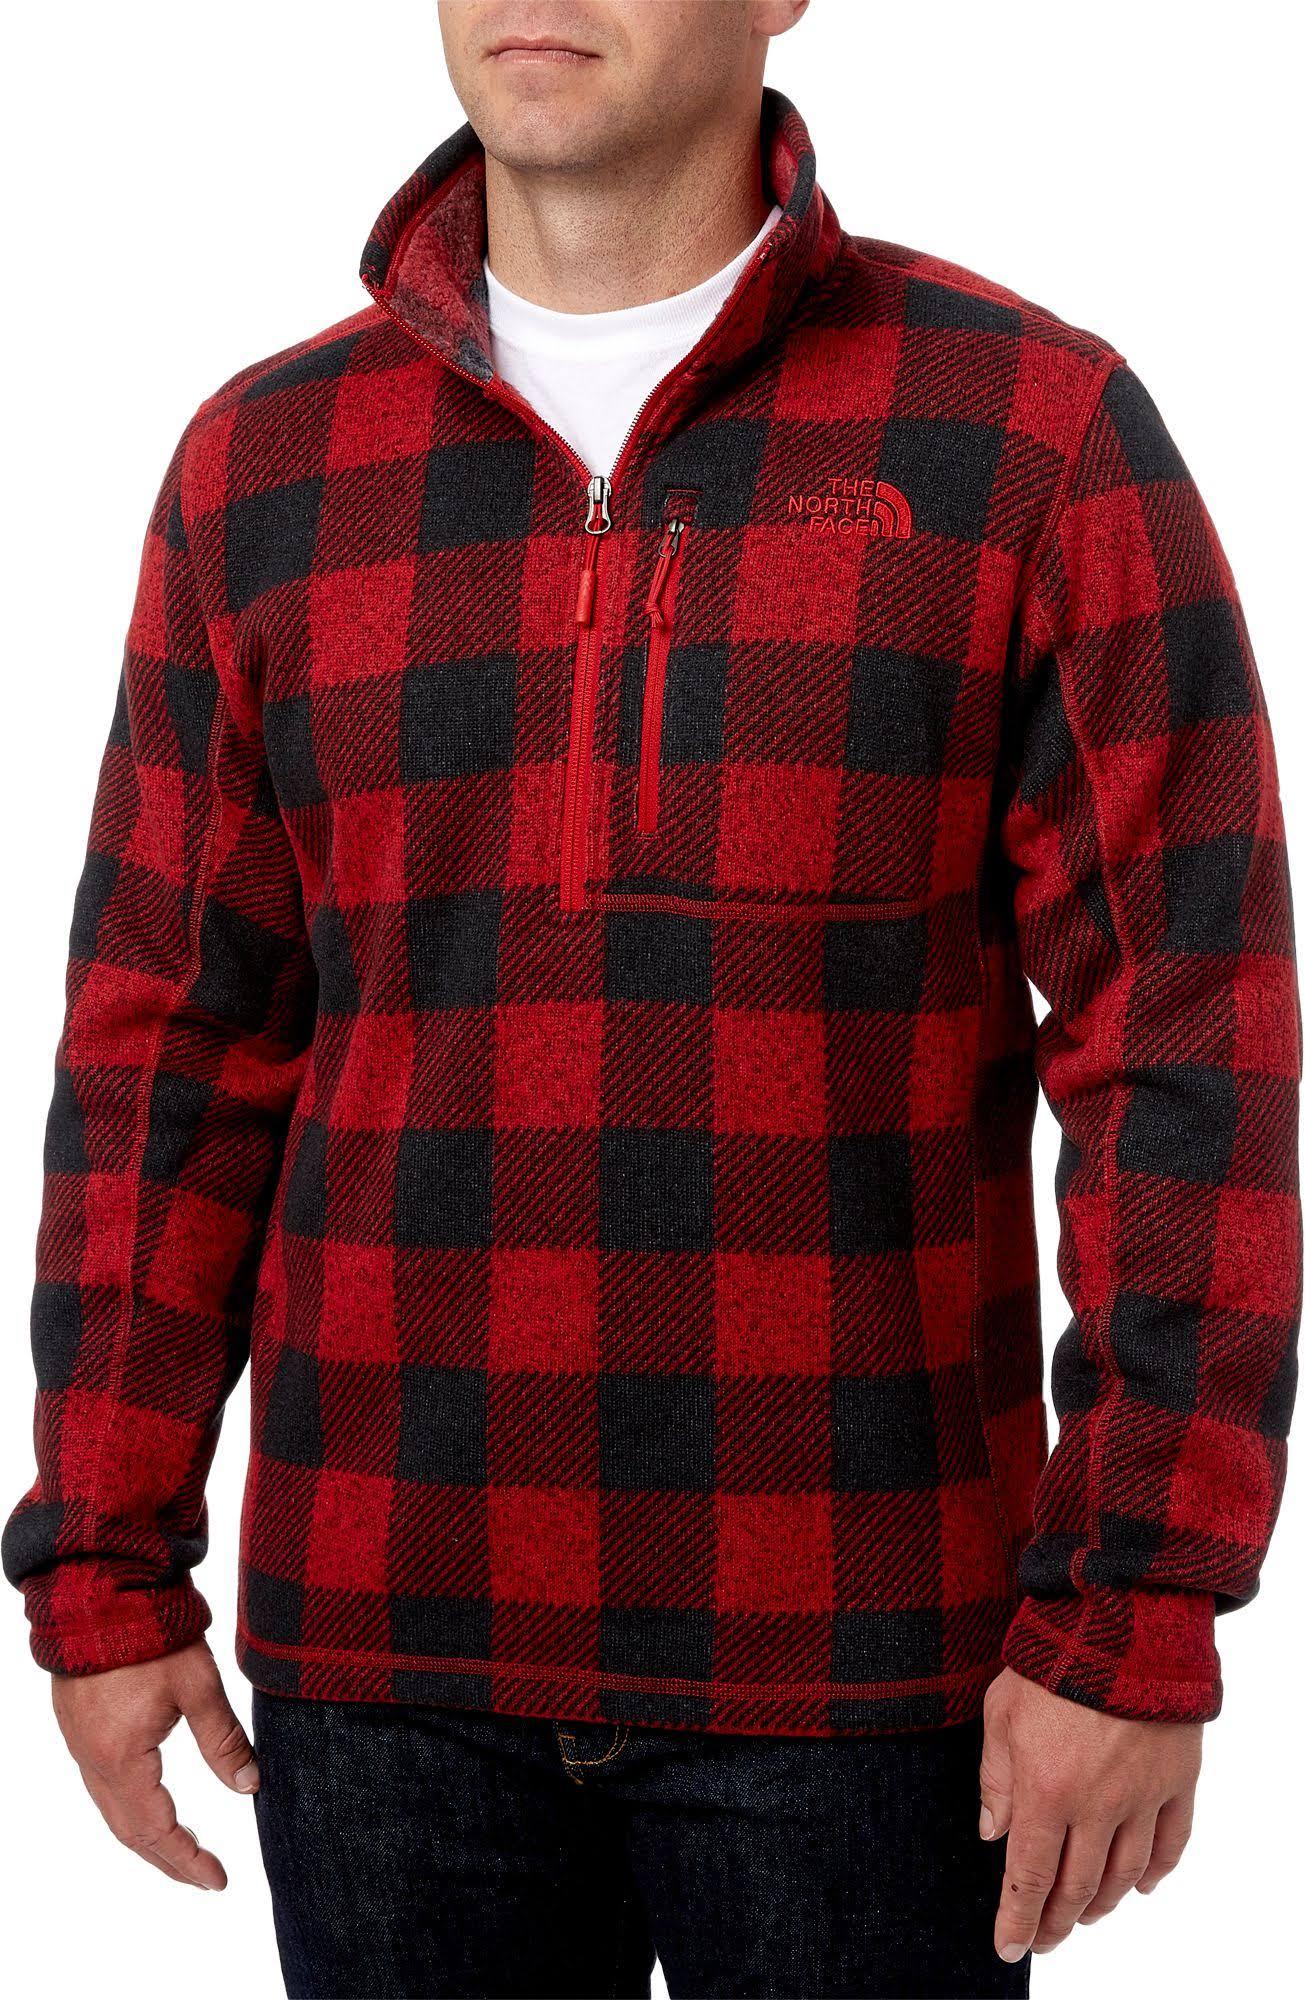 The Pullover Zip Neuheit Fleece Größe Lyons North Gordon Face 1 4 Herren Large UqnU6wrxv